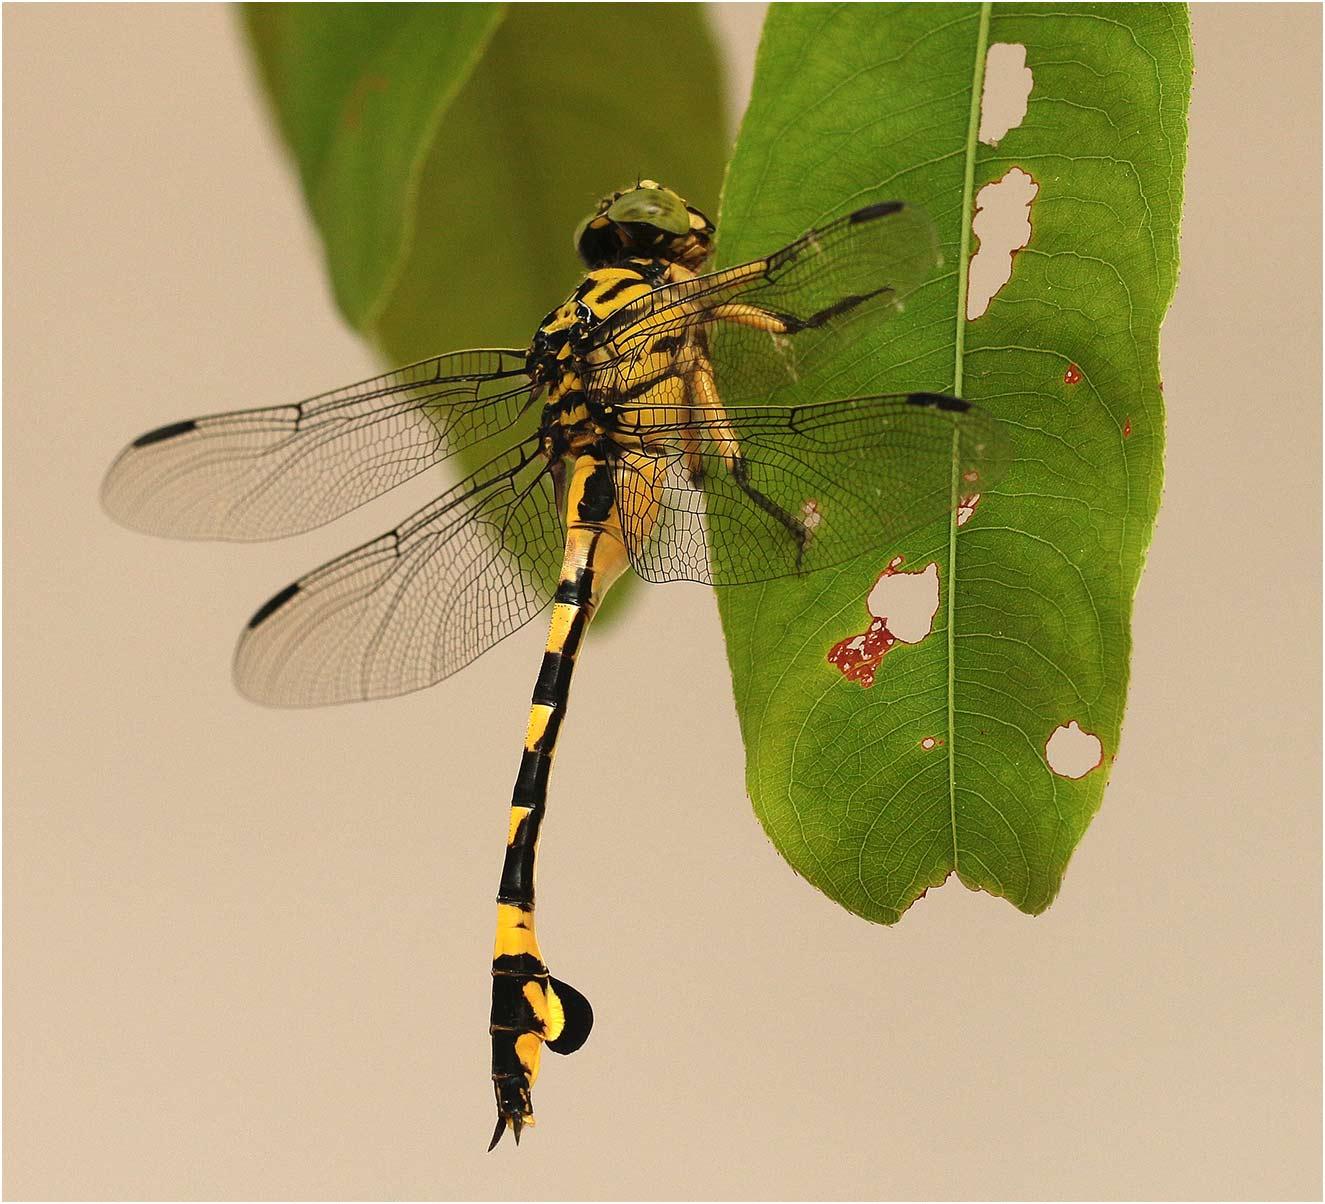 Sinictinogomphus clavatus femelle, Vietnam, Cuc Phong, 14/06/18